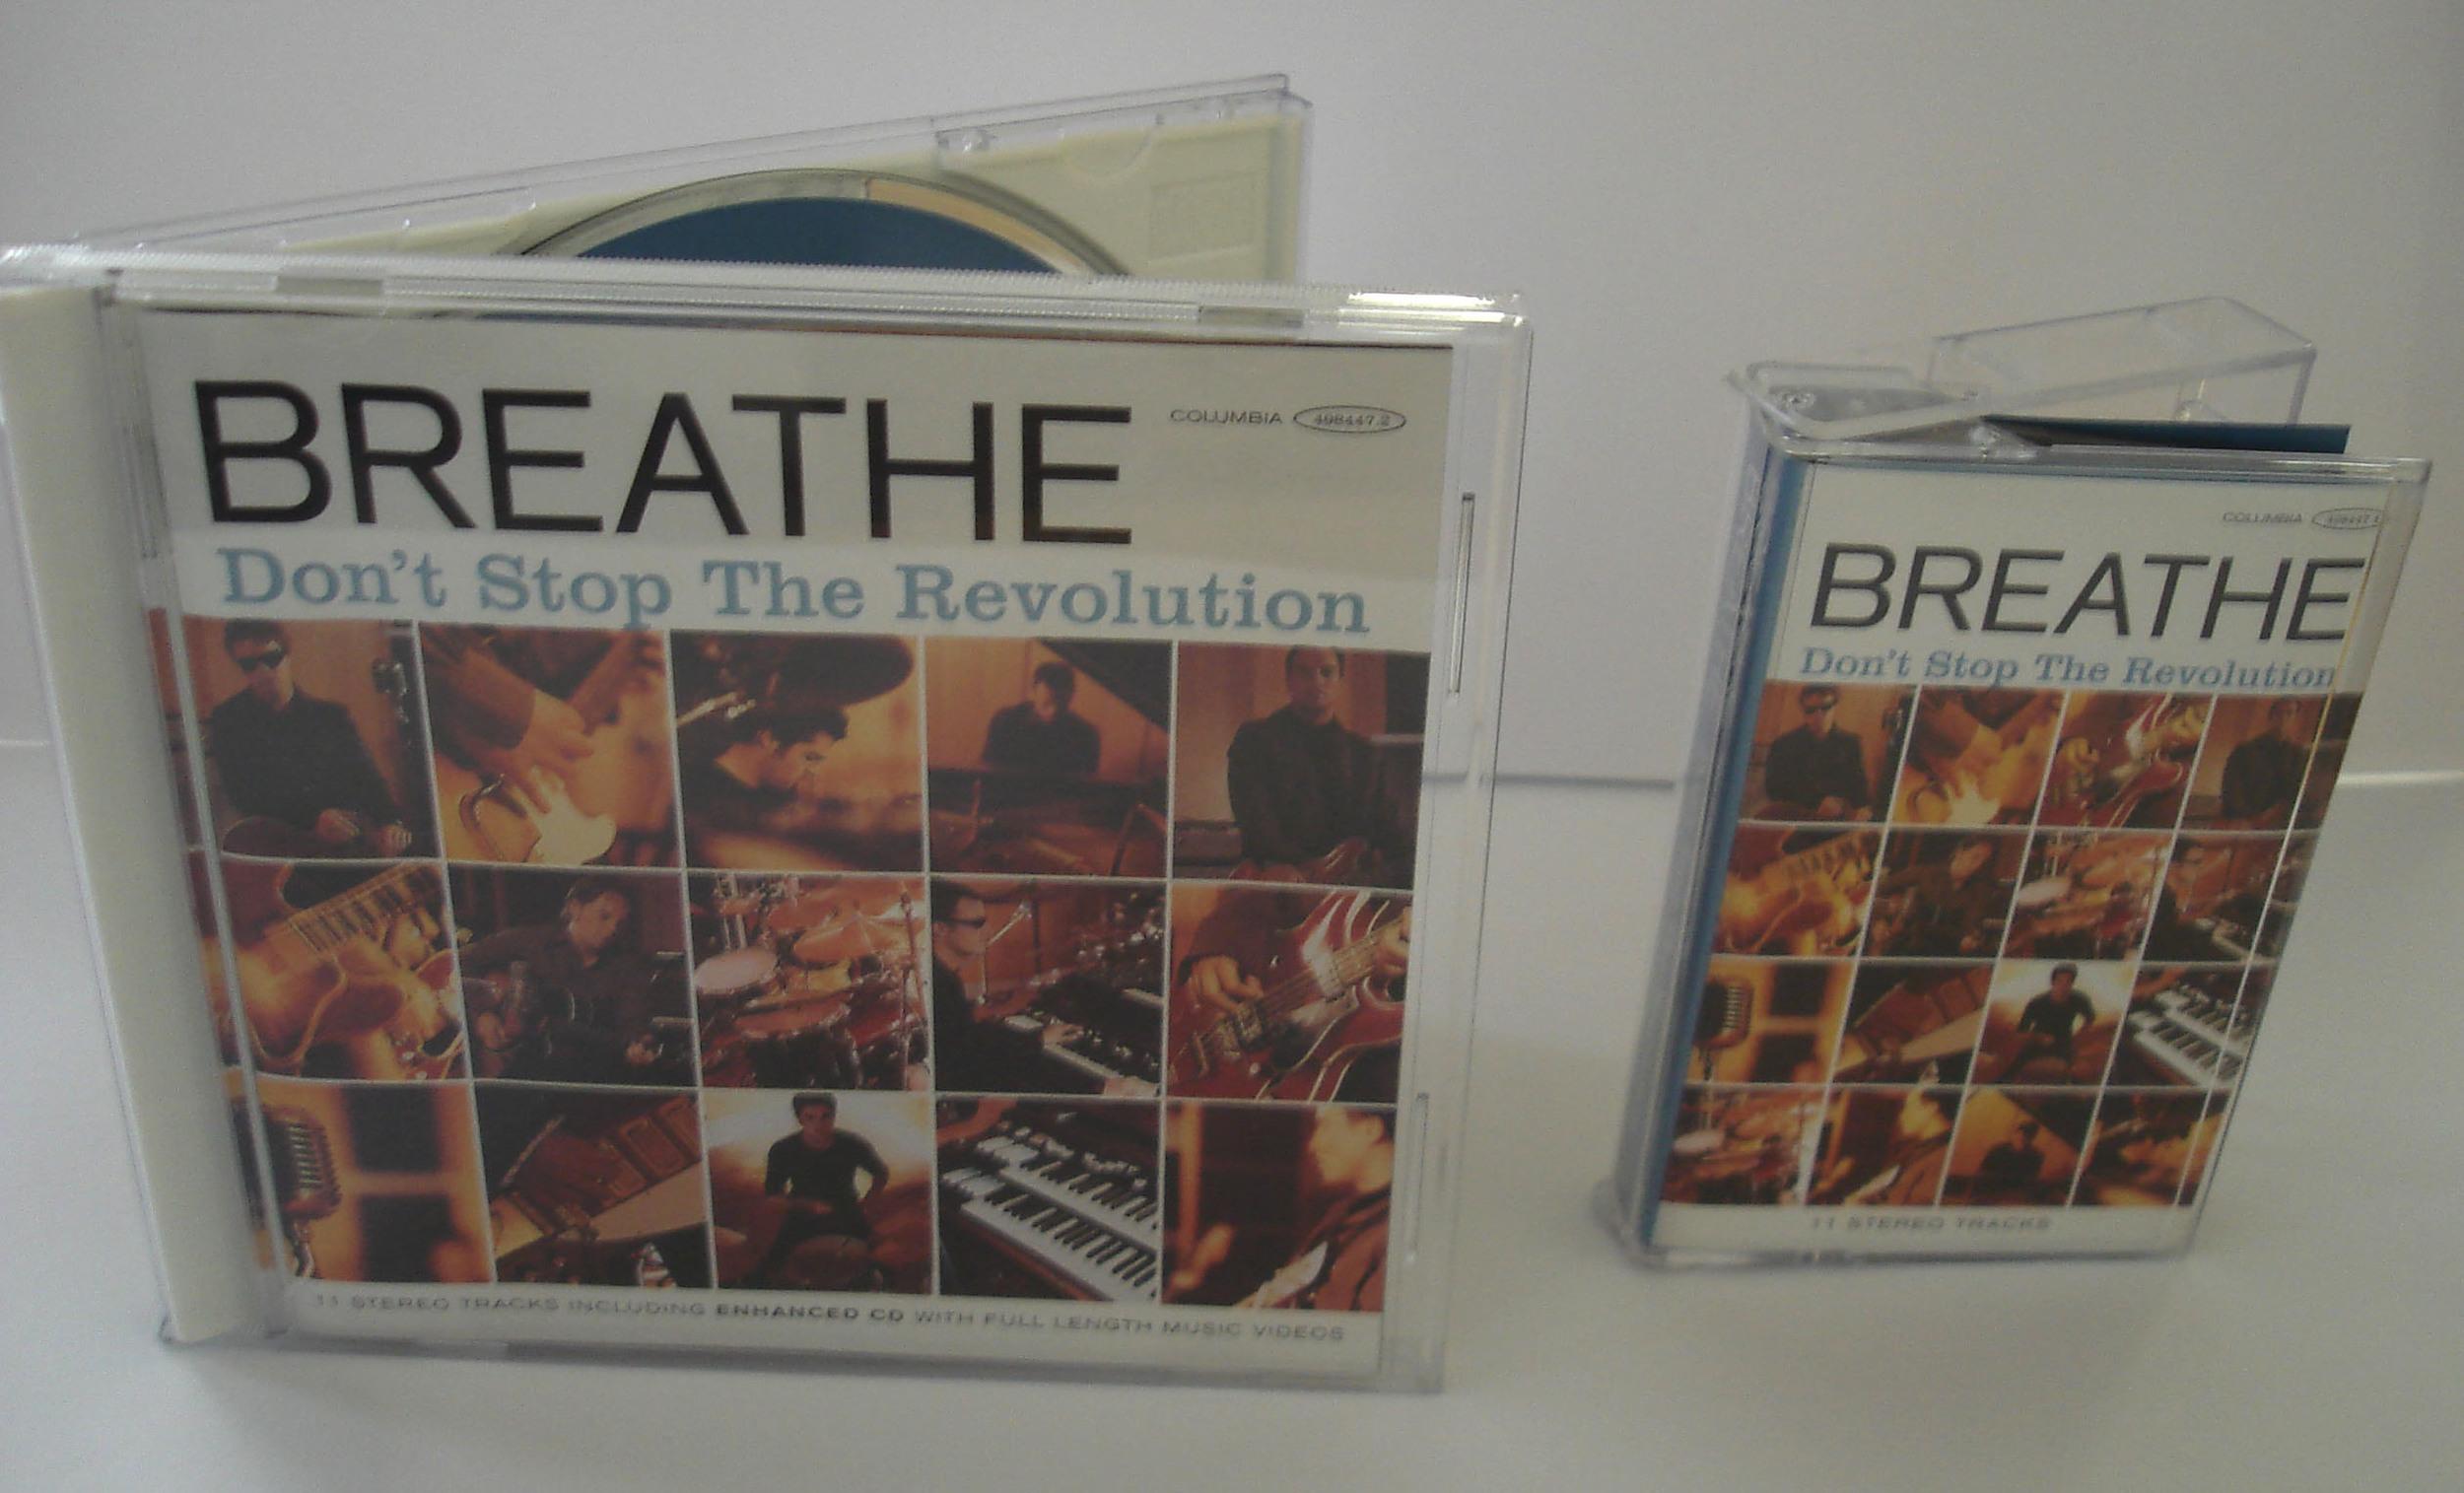 BREATHE - DON'T STOP THE REVOLUTION - ALBUM